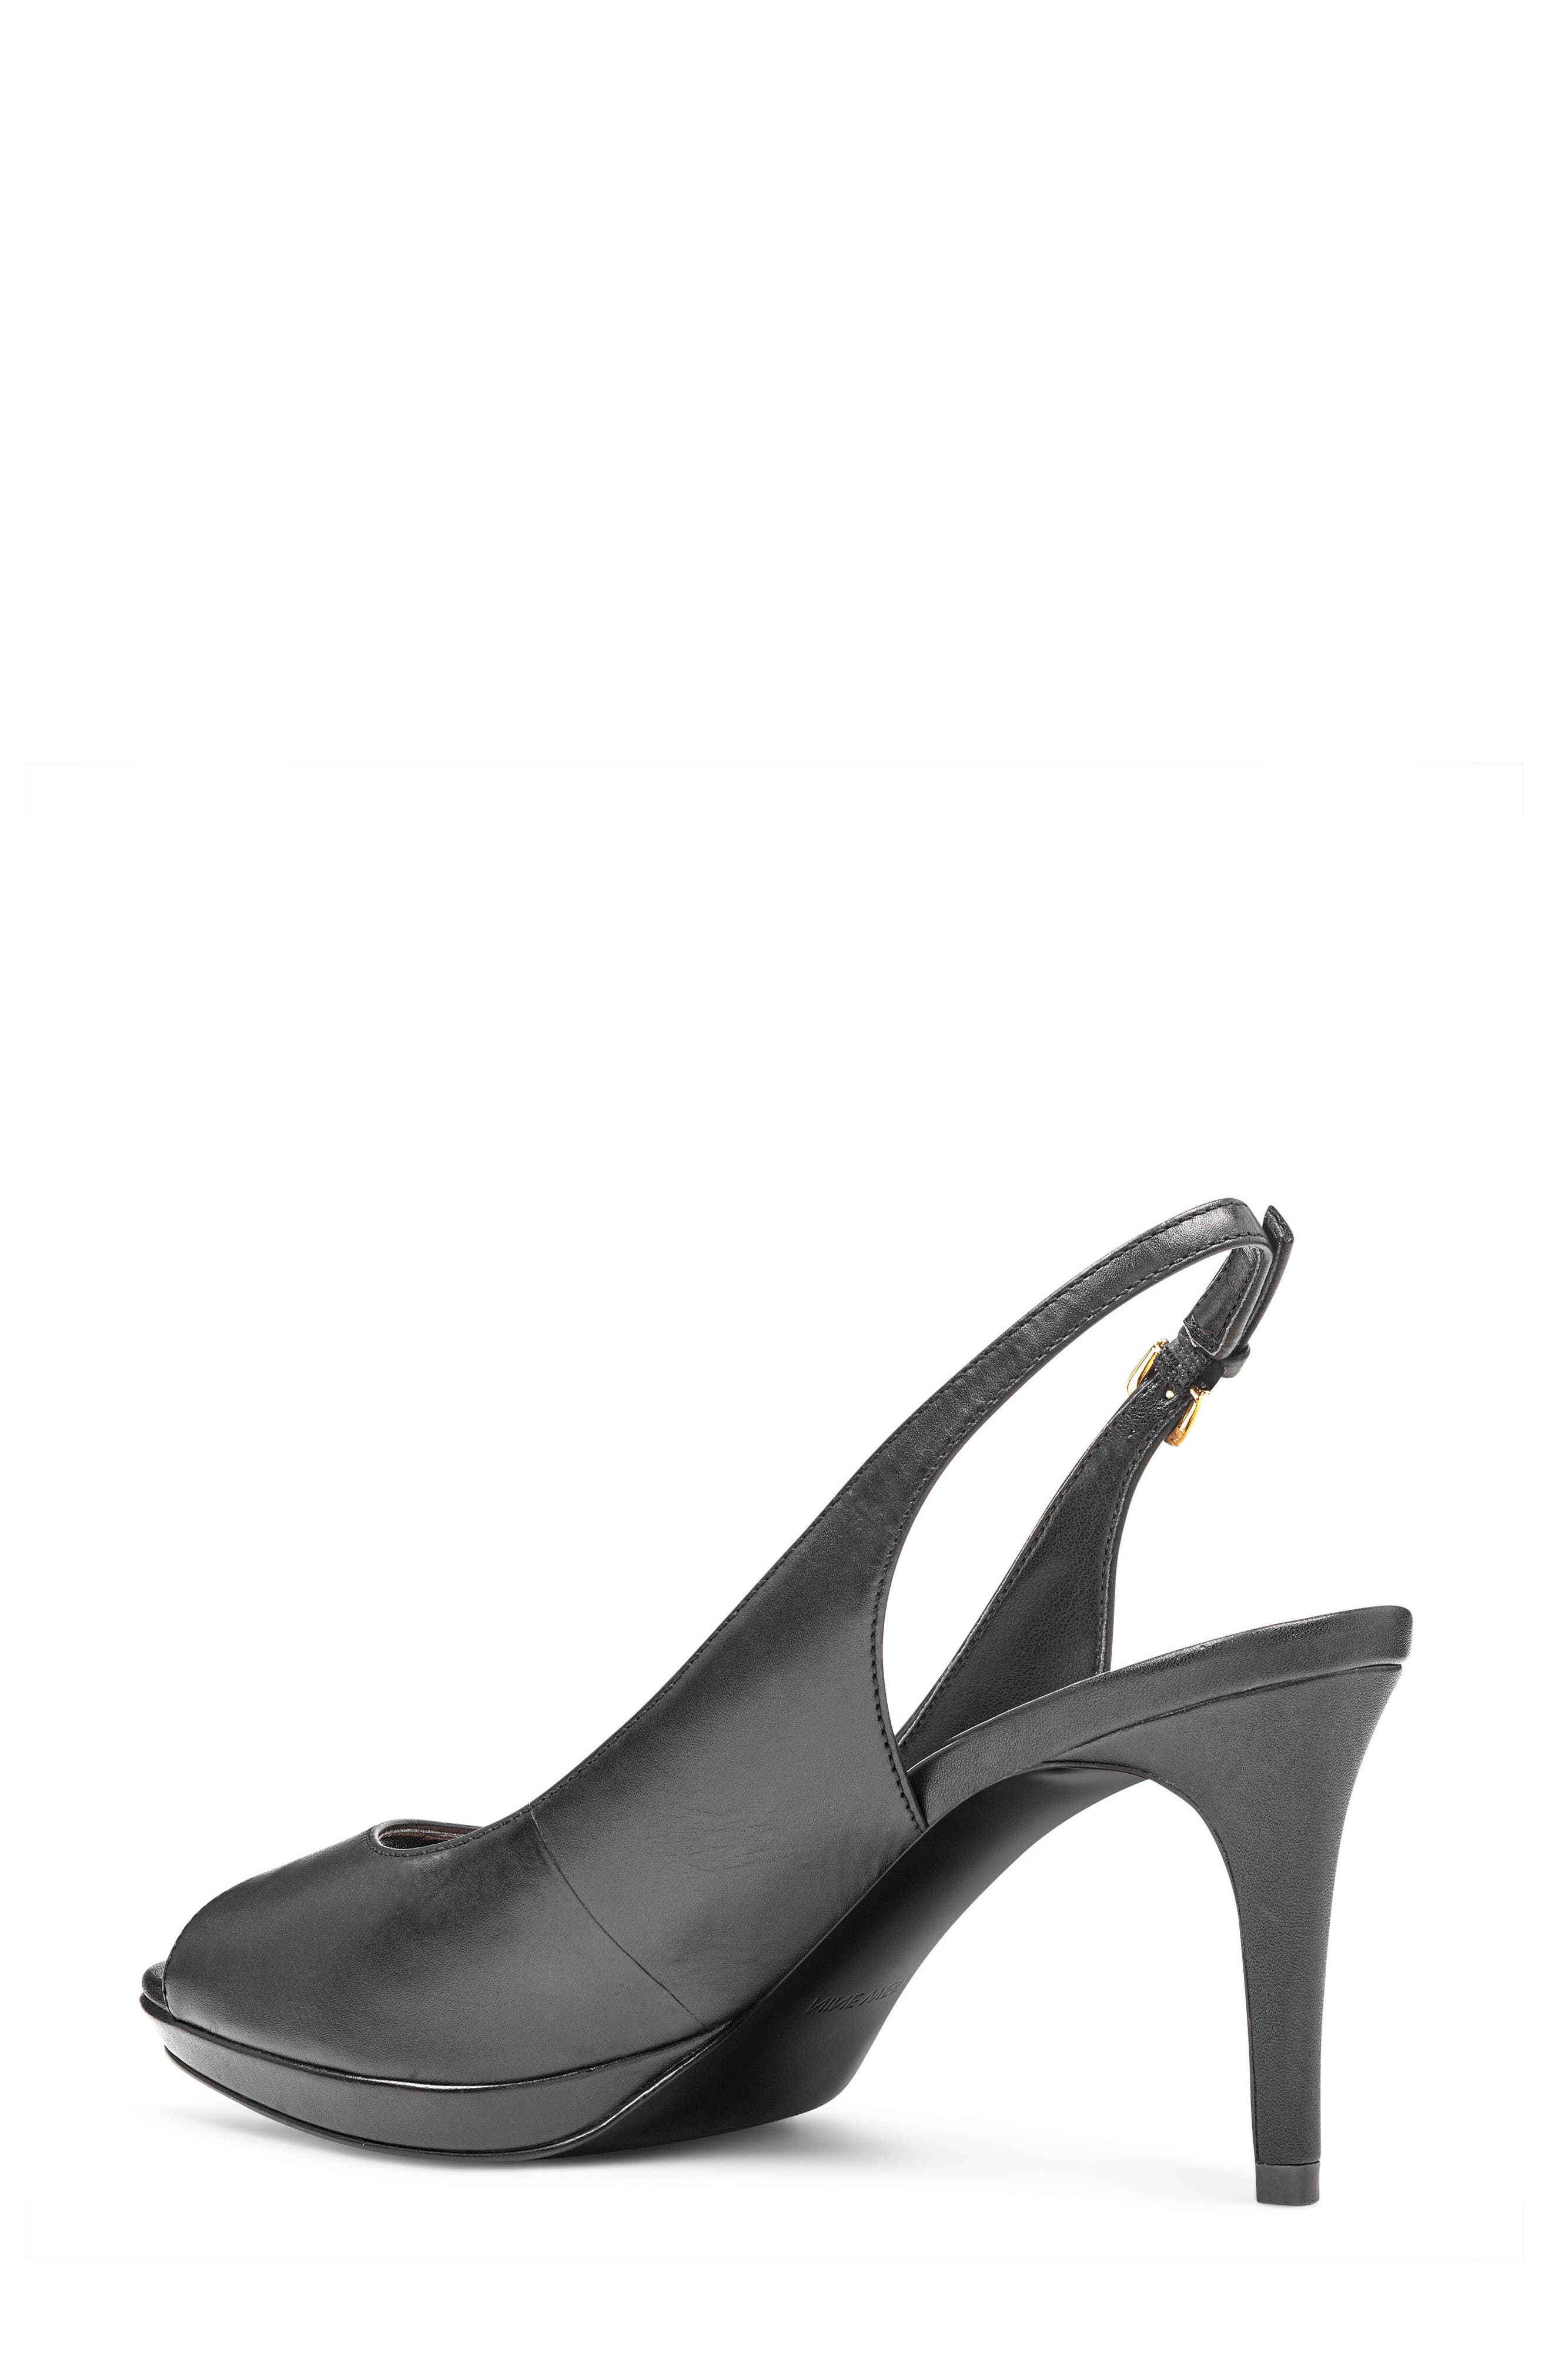 Gabrielle Peep Toe Slingback Pump,                             Alternate thumbnail 2, color,                             001